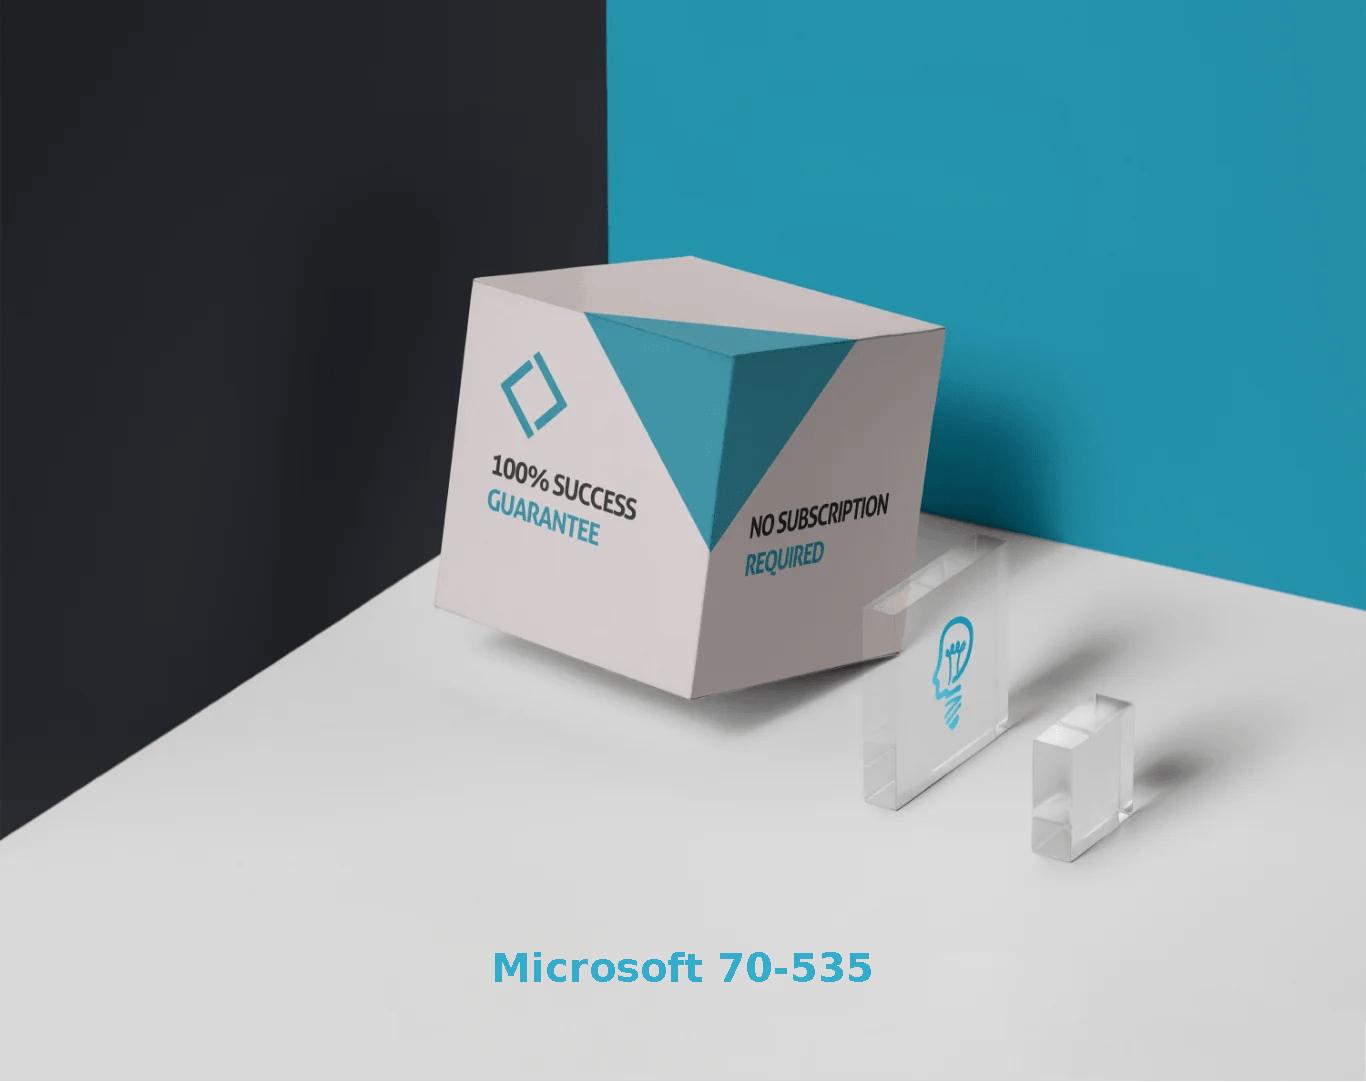 Microsoft 70-535 Exams